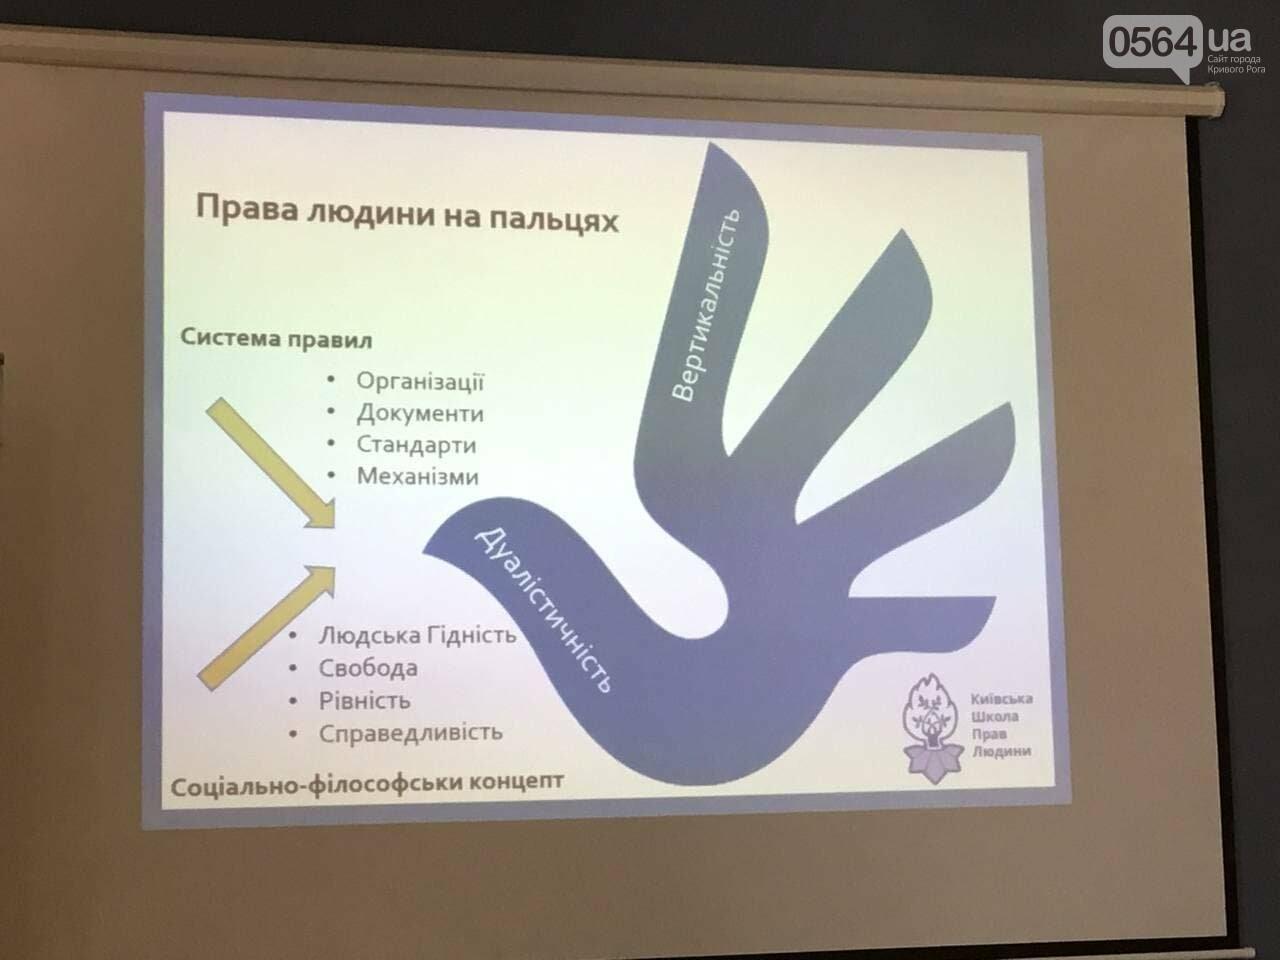 Криворожанам прочитали лекции о гендерном (не) равенстве и правах человека, - ФОТО, ВИДЕО, фото-11